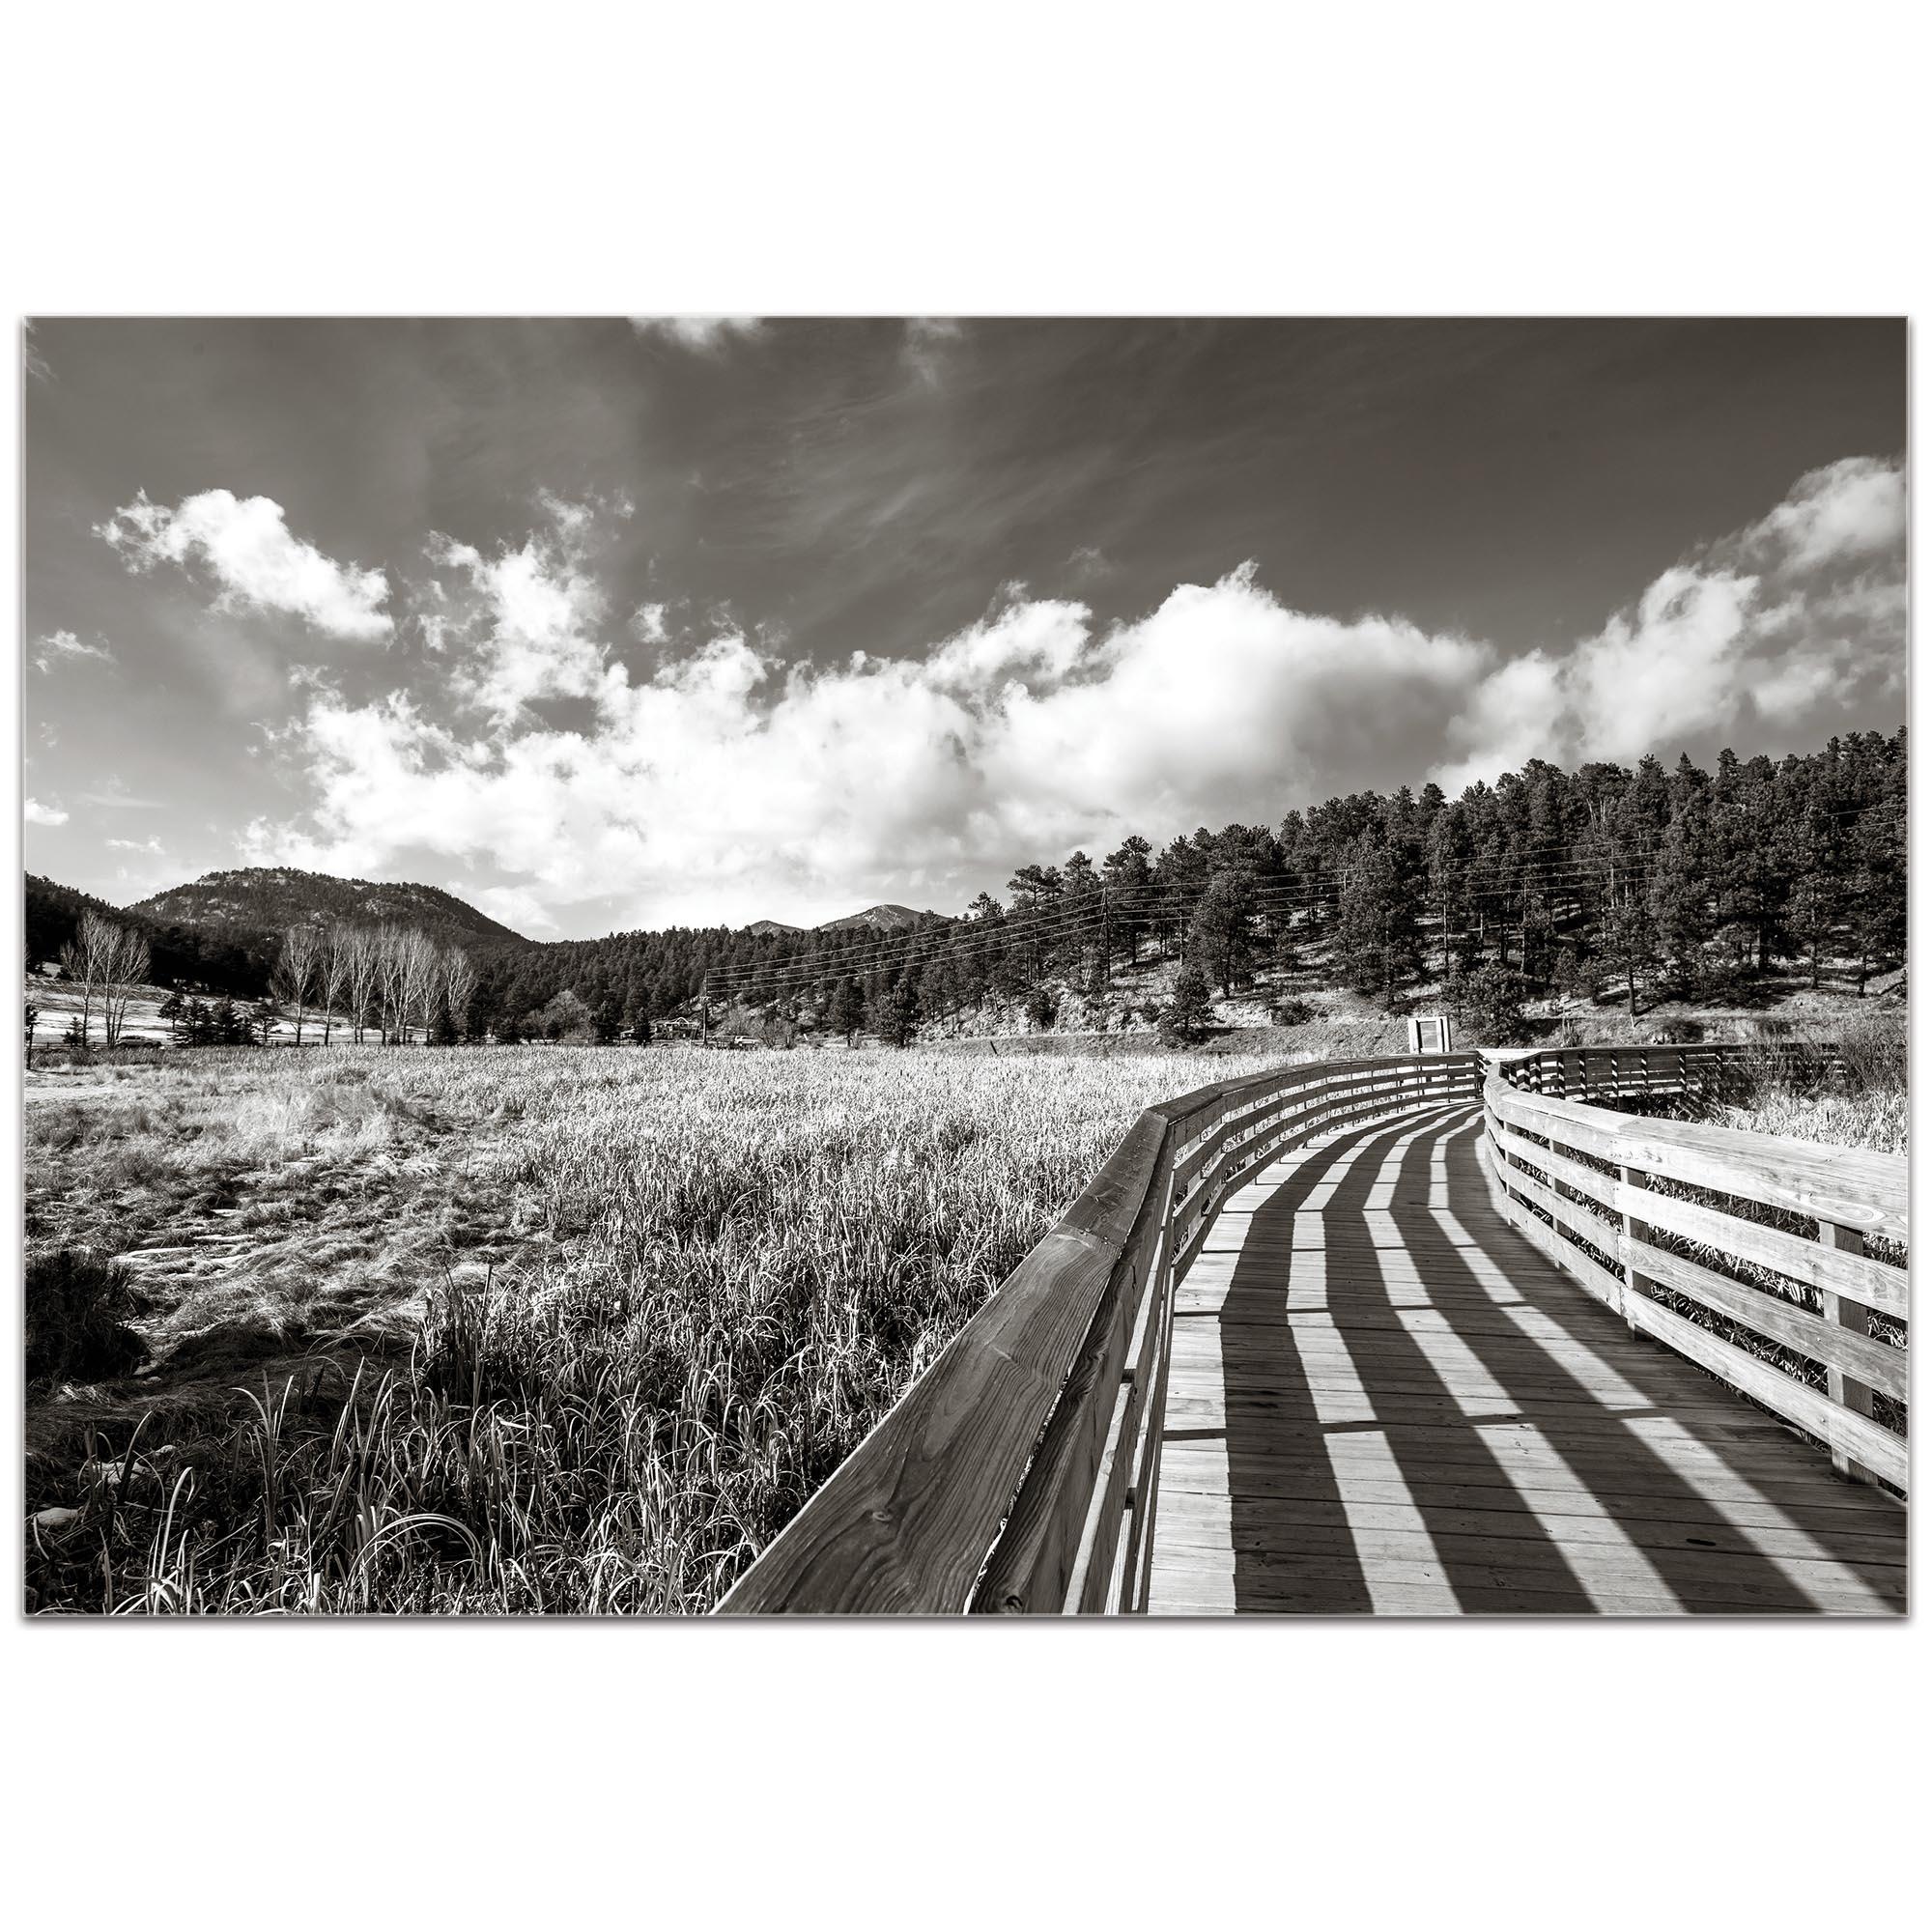 Film Noir Wall Art 'Wooden Walkway' - Dramatic Landscape Decor on Metal or Plexiglass - Image 2